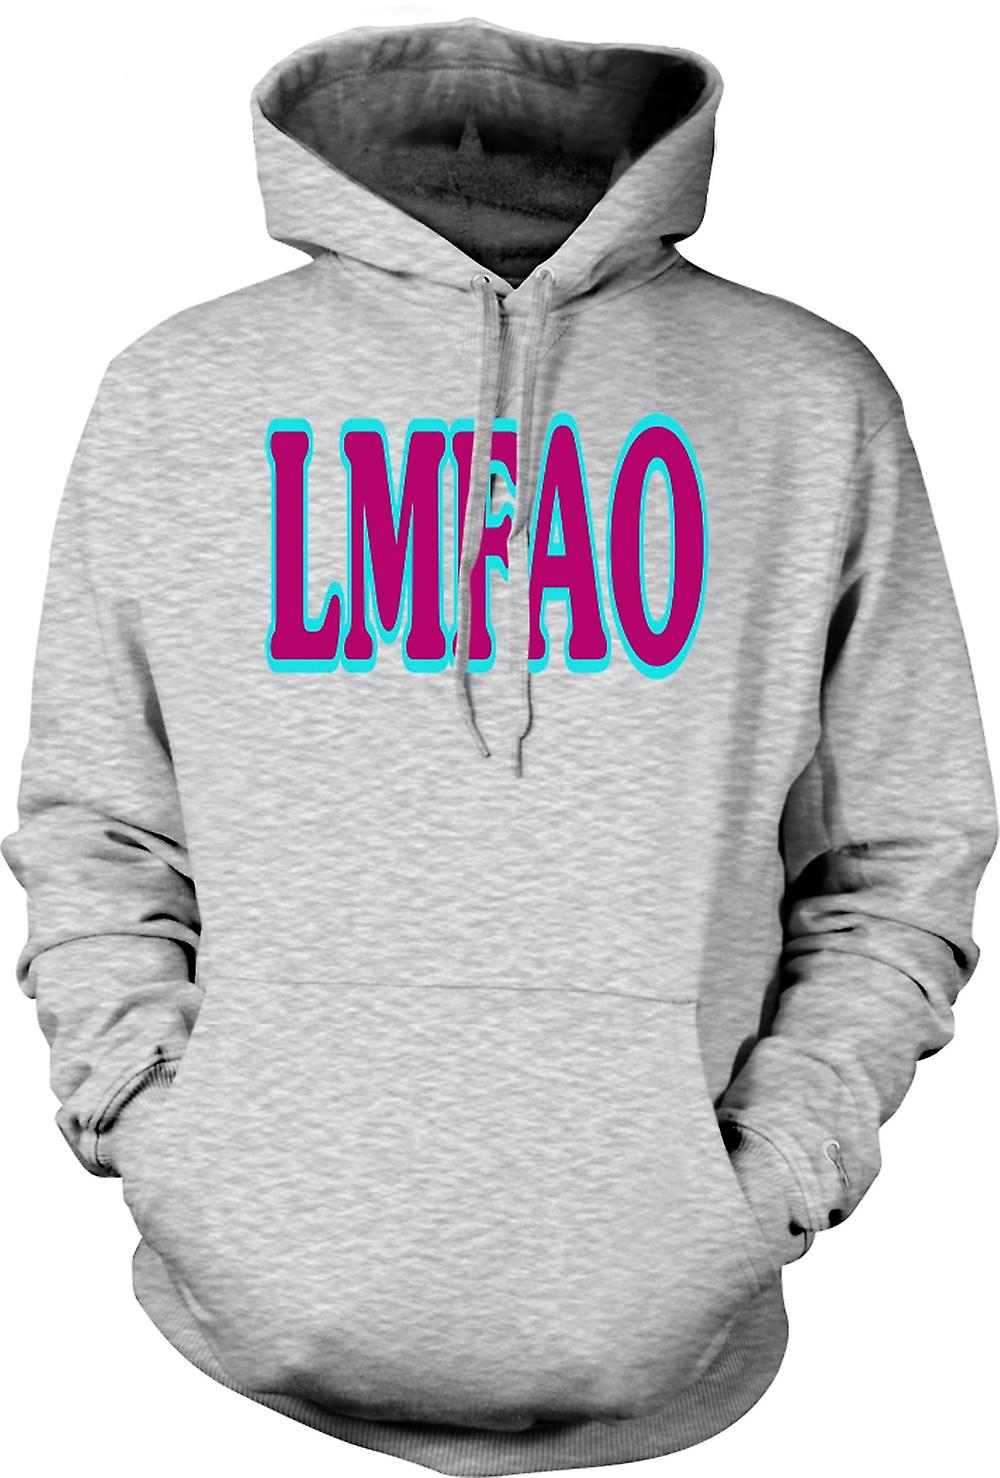 Mens Hoodie - Lmfao - Funny